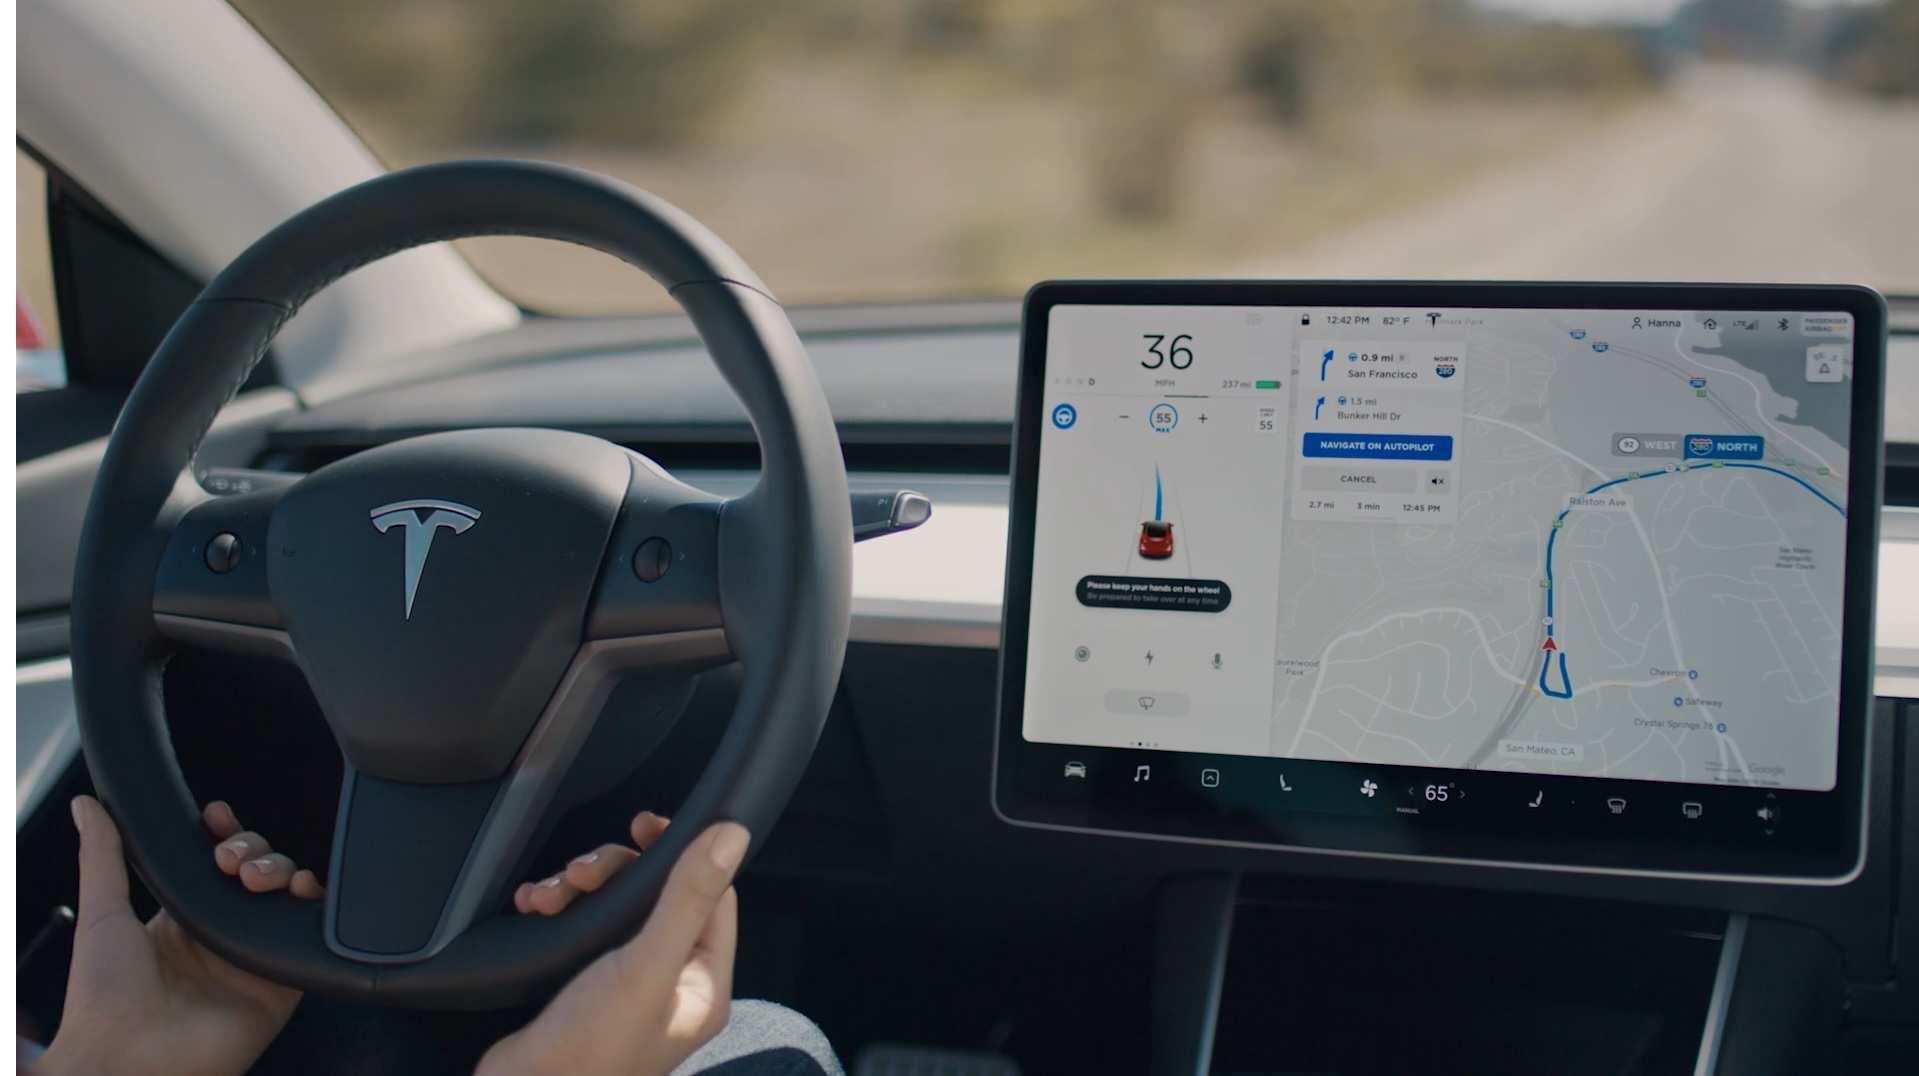 30 Gallery of Tesla Autopilot 2019 Ratings with Tesla Autopilot 2019